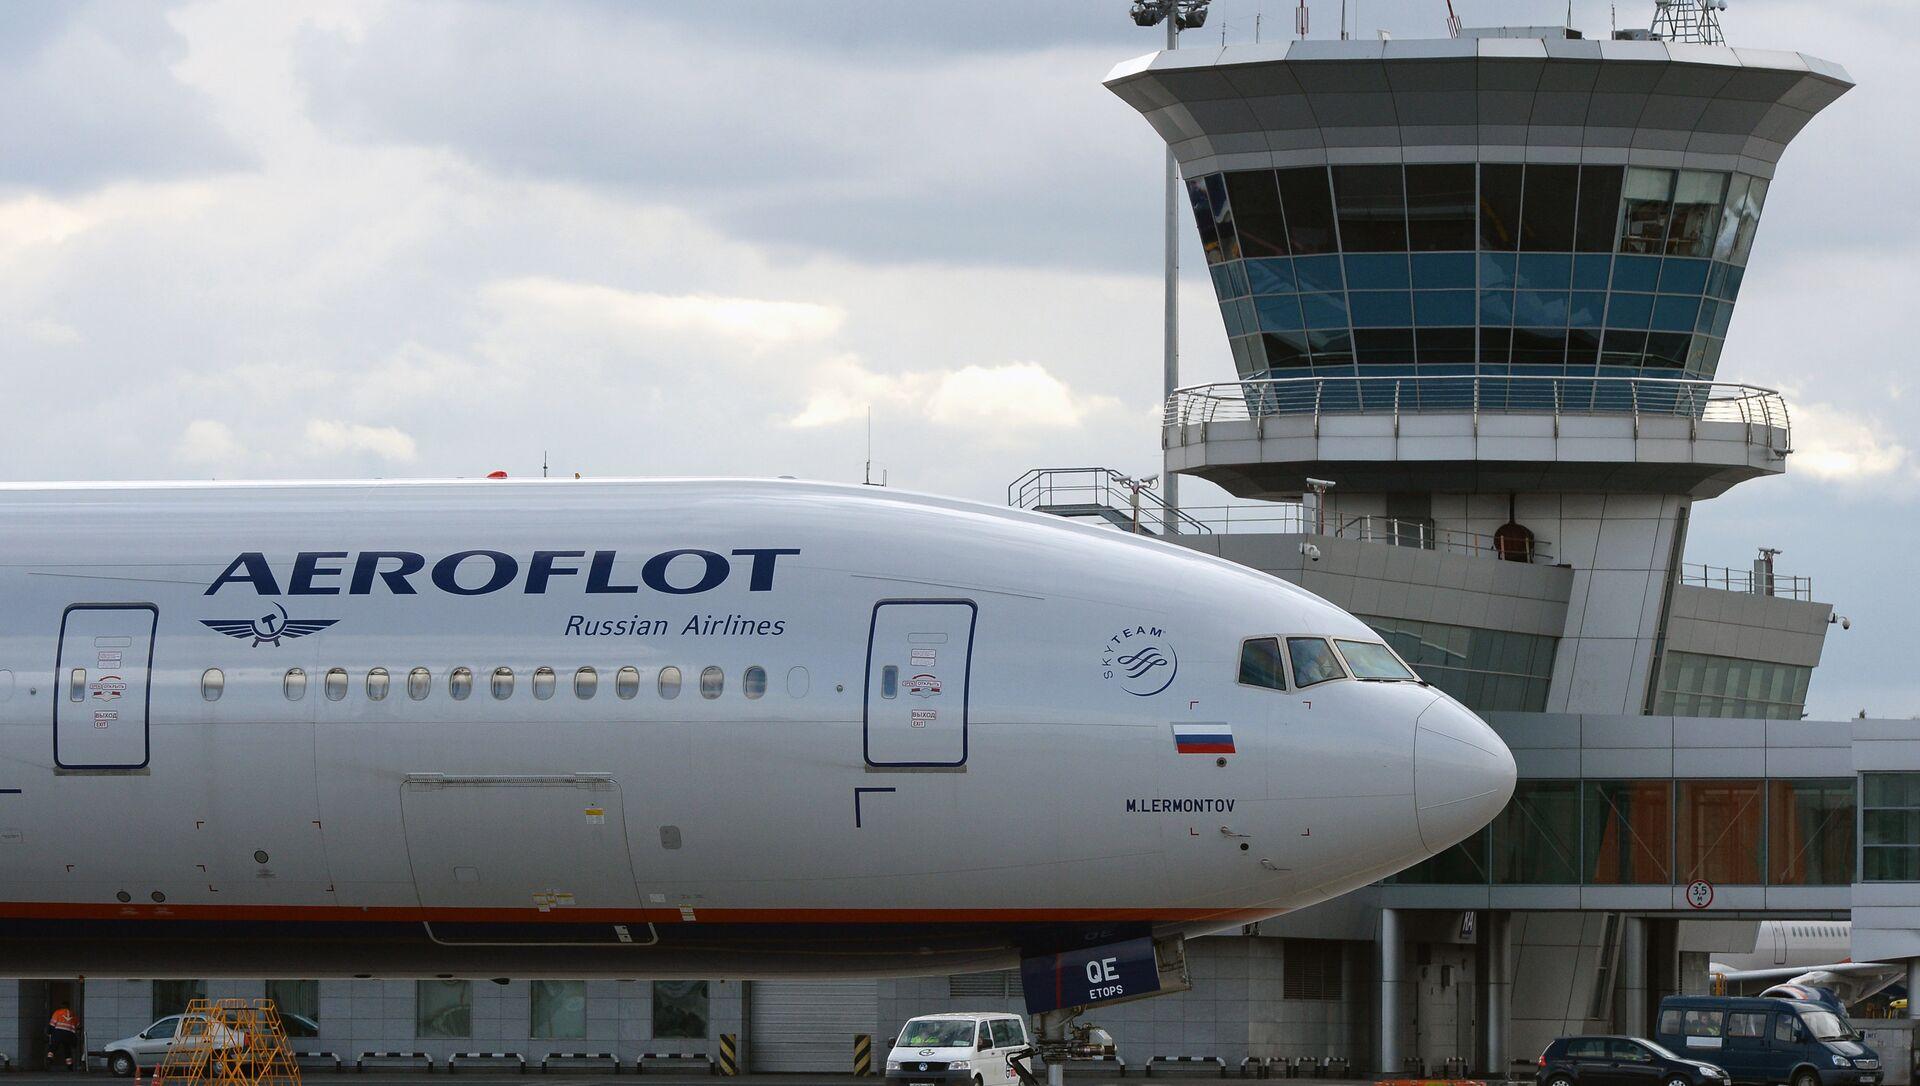 Un Boeing 777 di Aeroflot - Sputnik Italia, 1920, 01.04.2021